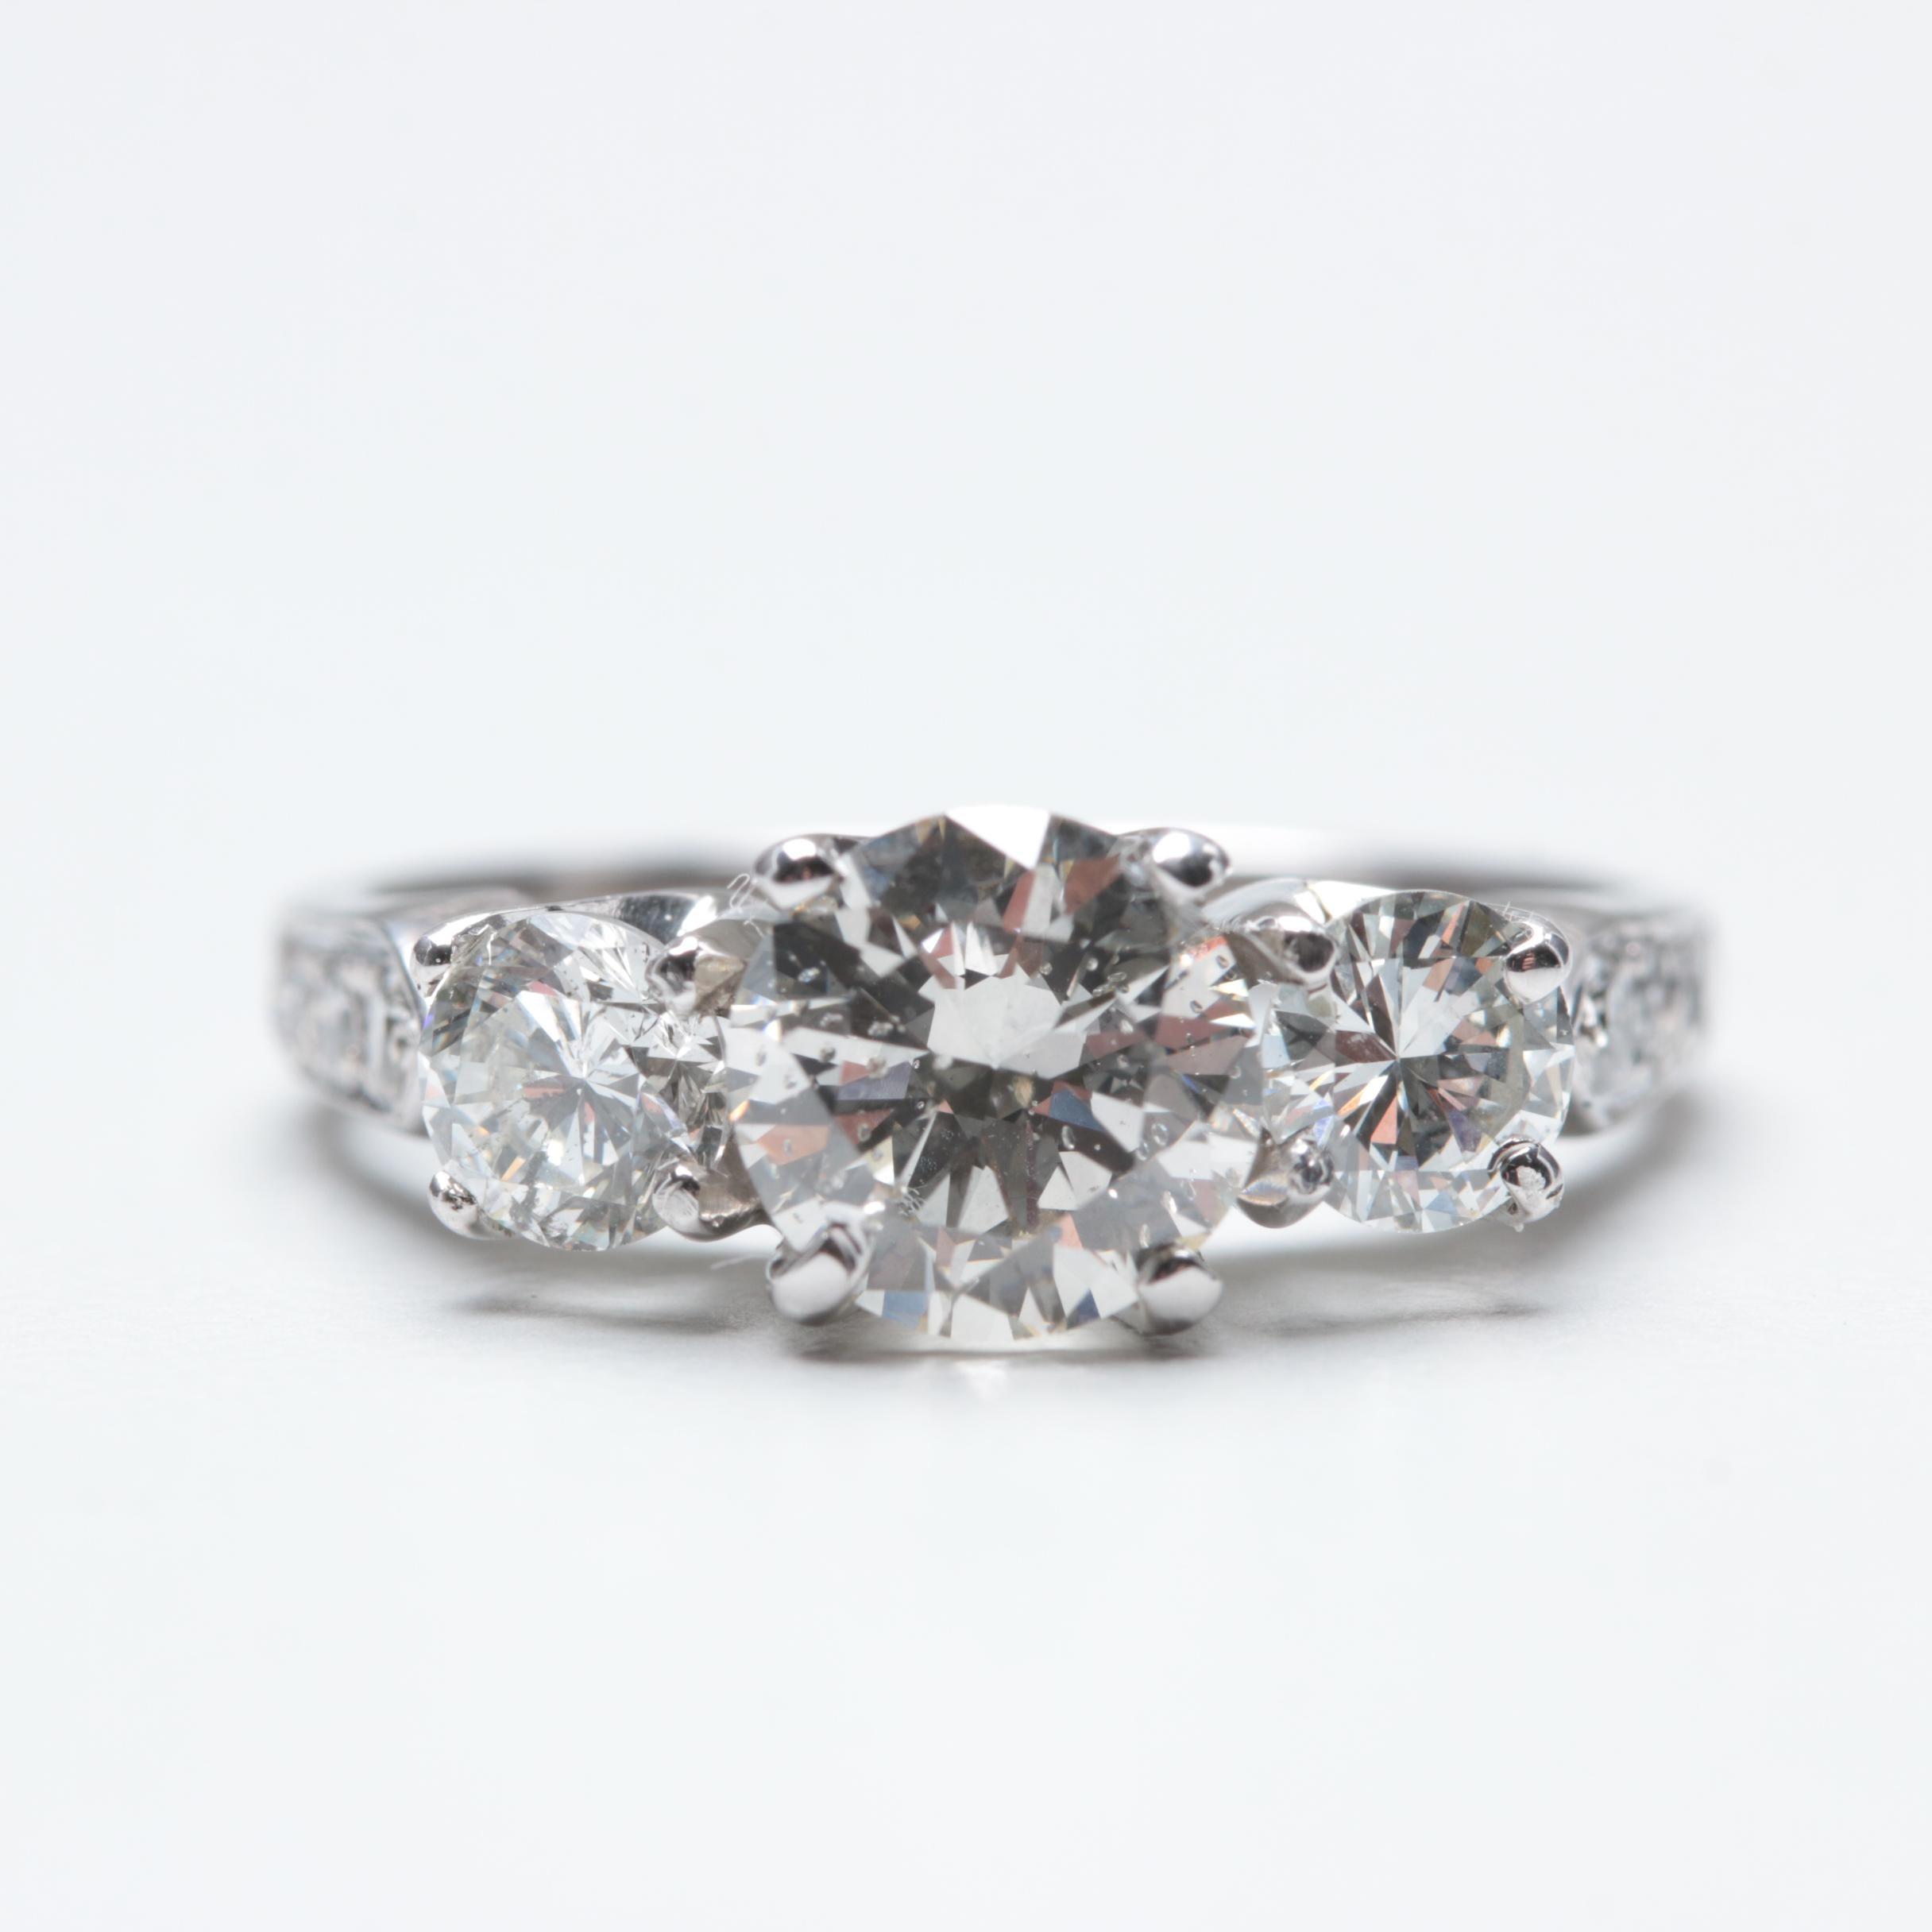 14K White Gold 1.78 CTW Diamond Ring